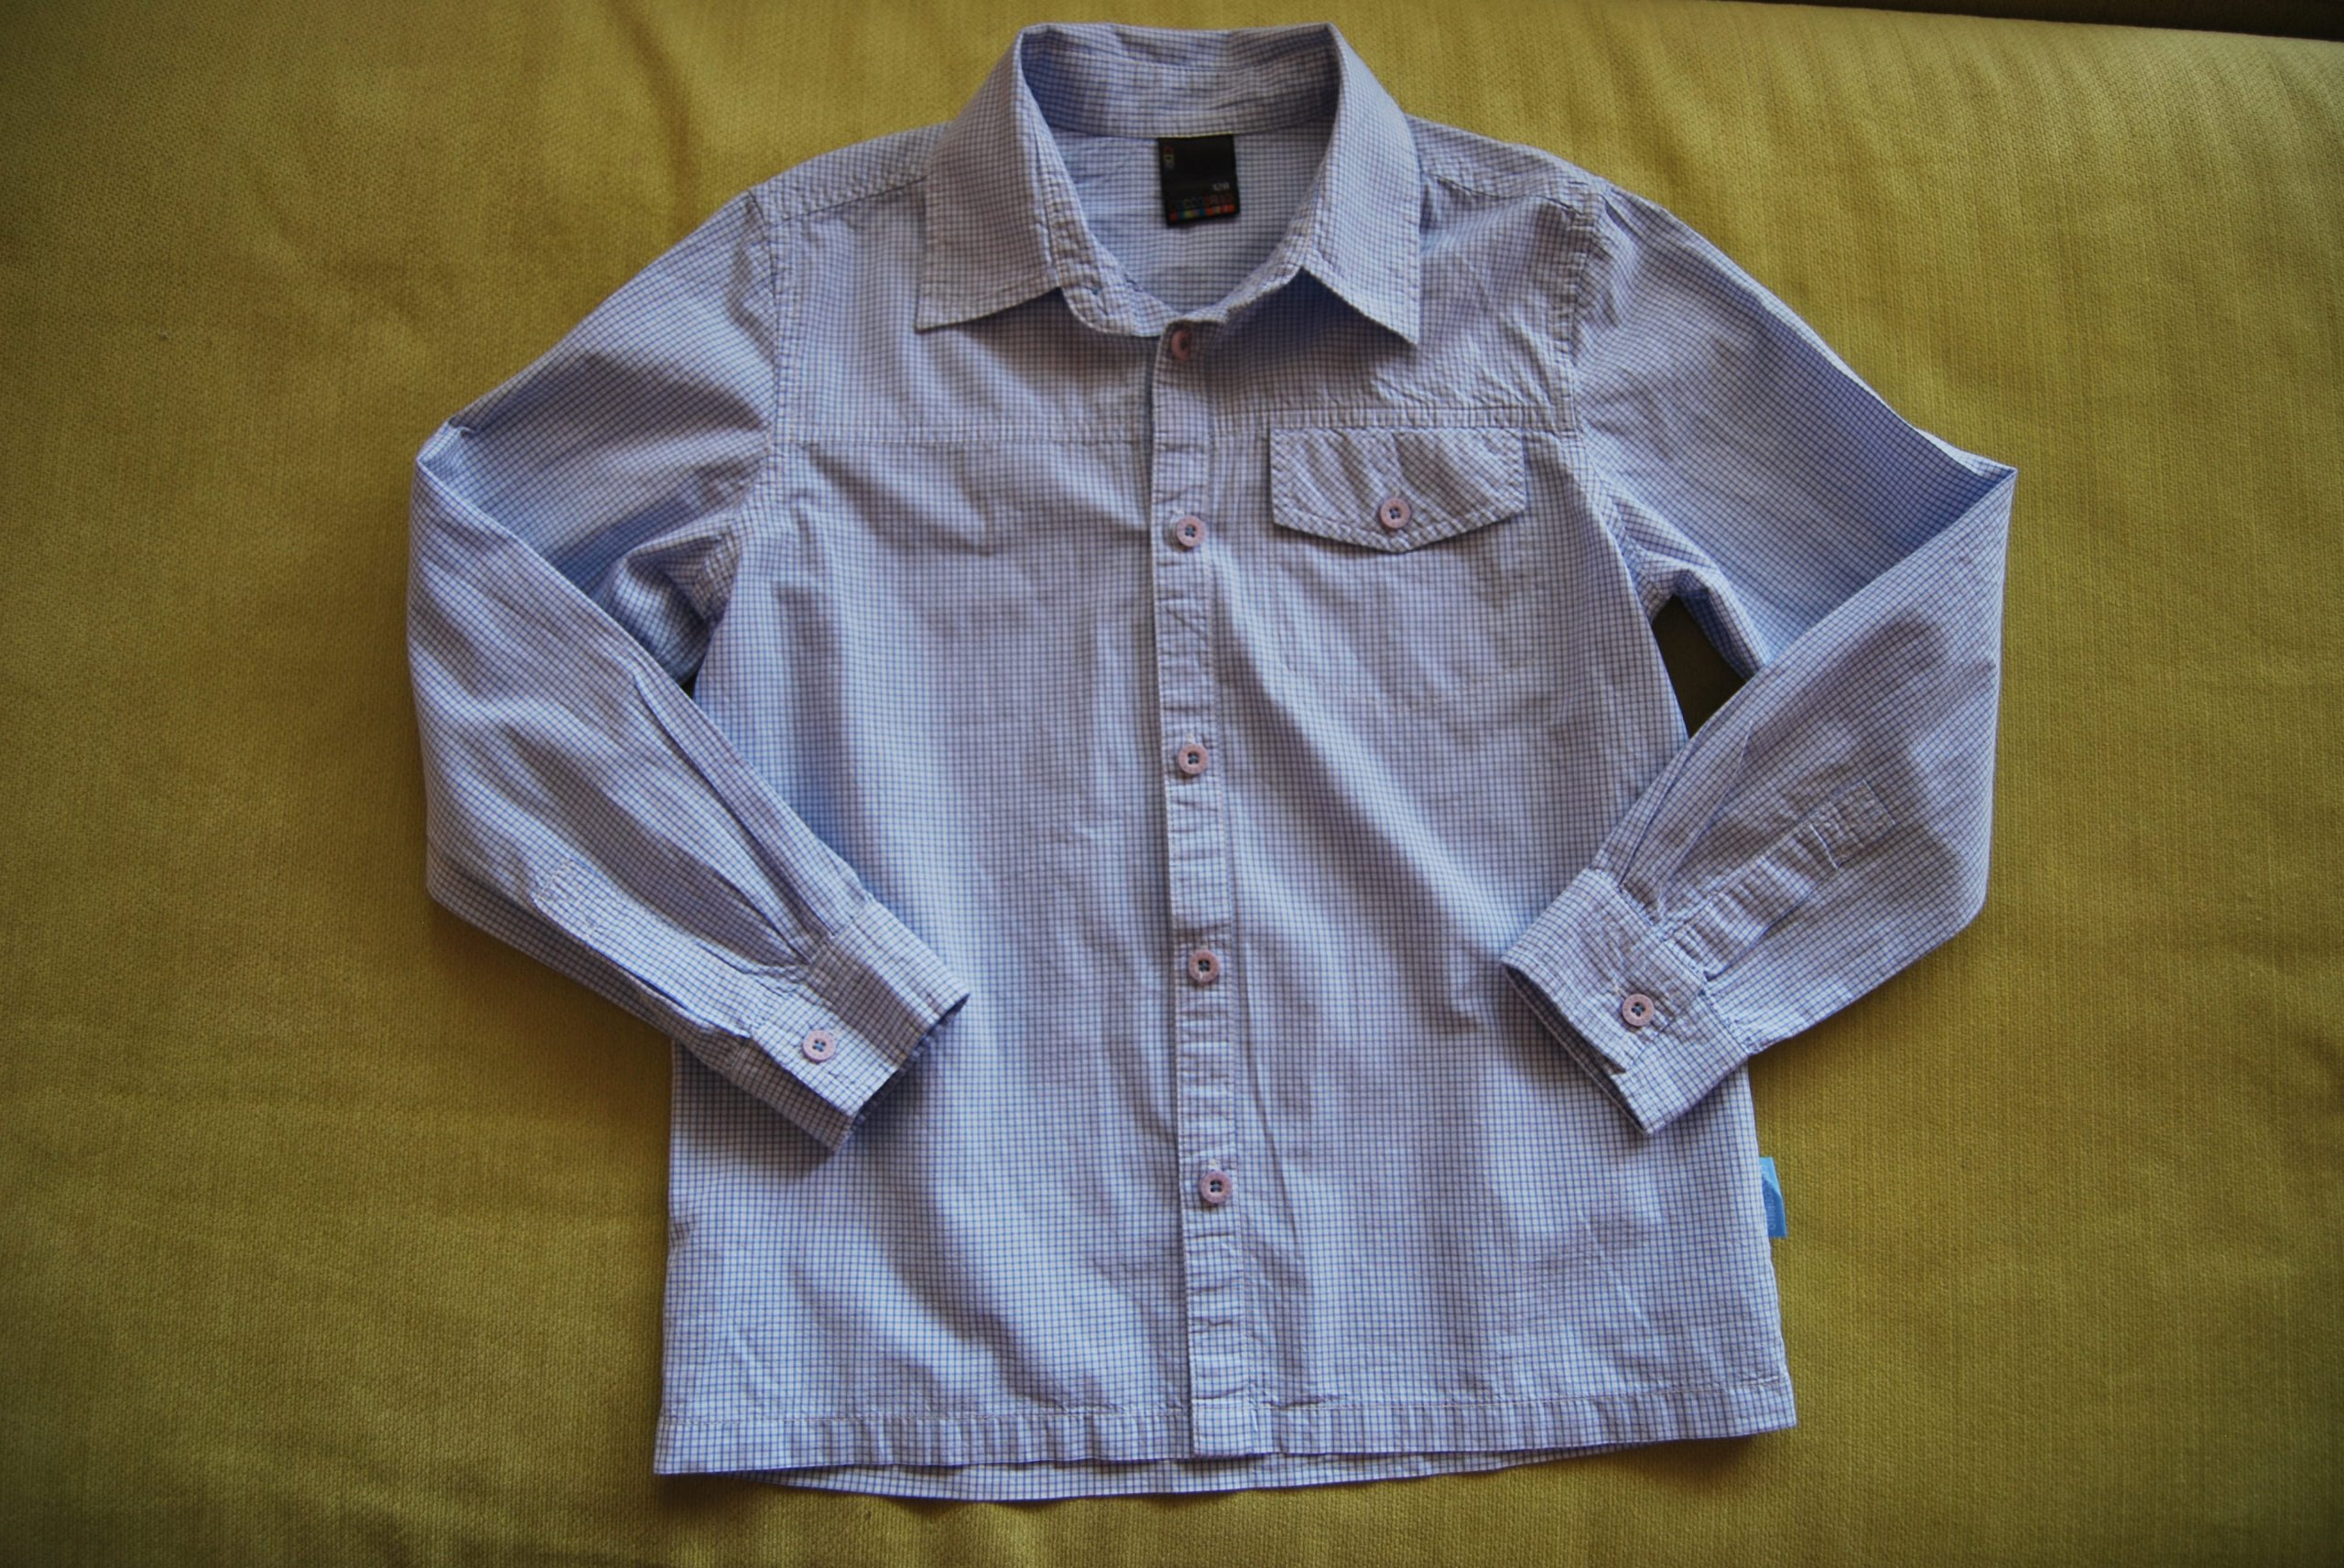 COCCODRILLO koszula W KRATĘ 128 cm 8 lat